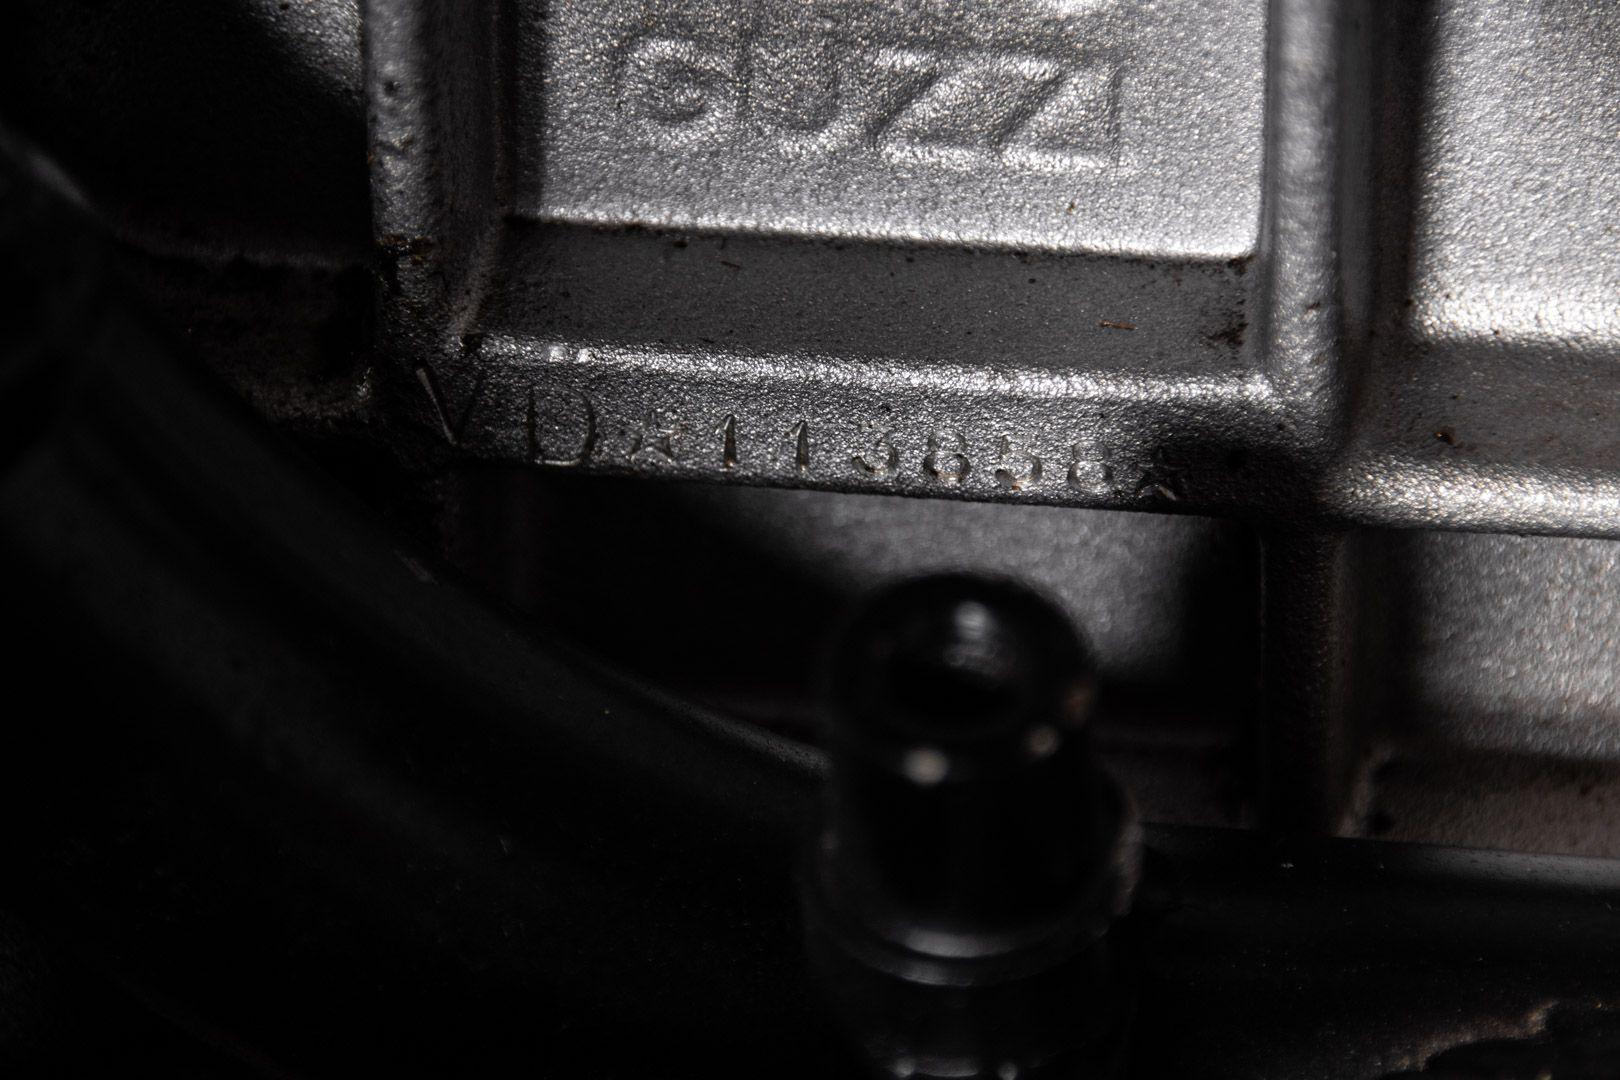 1981 Moto Guzzi 850 T3 California 83266